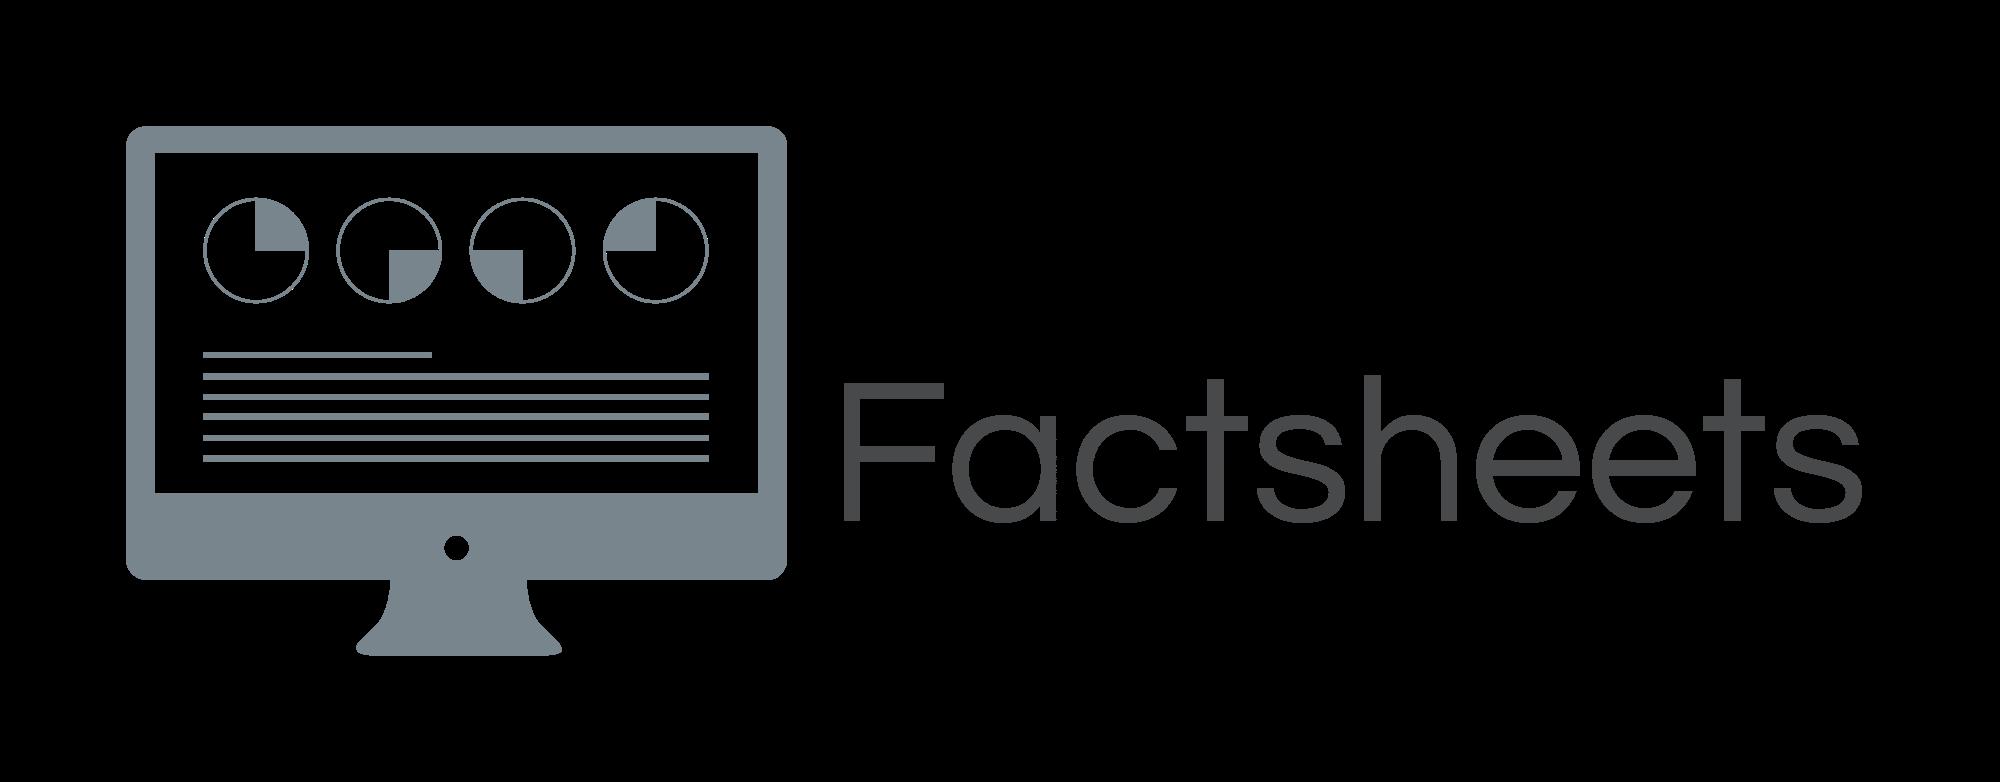 Factsheets-logo.png